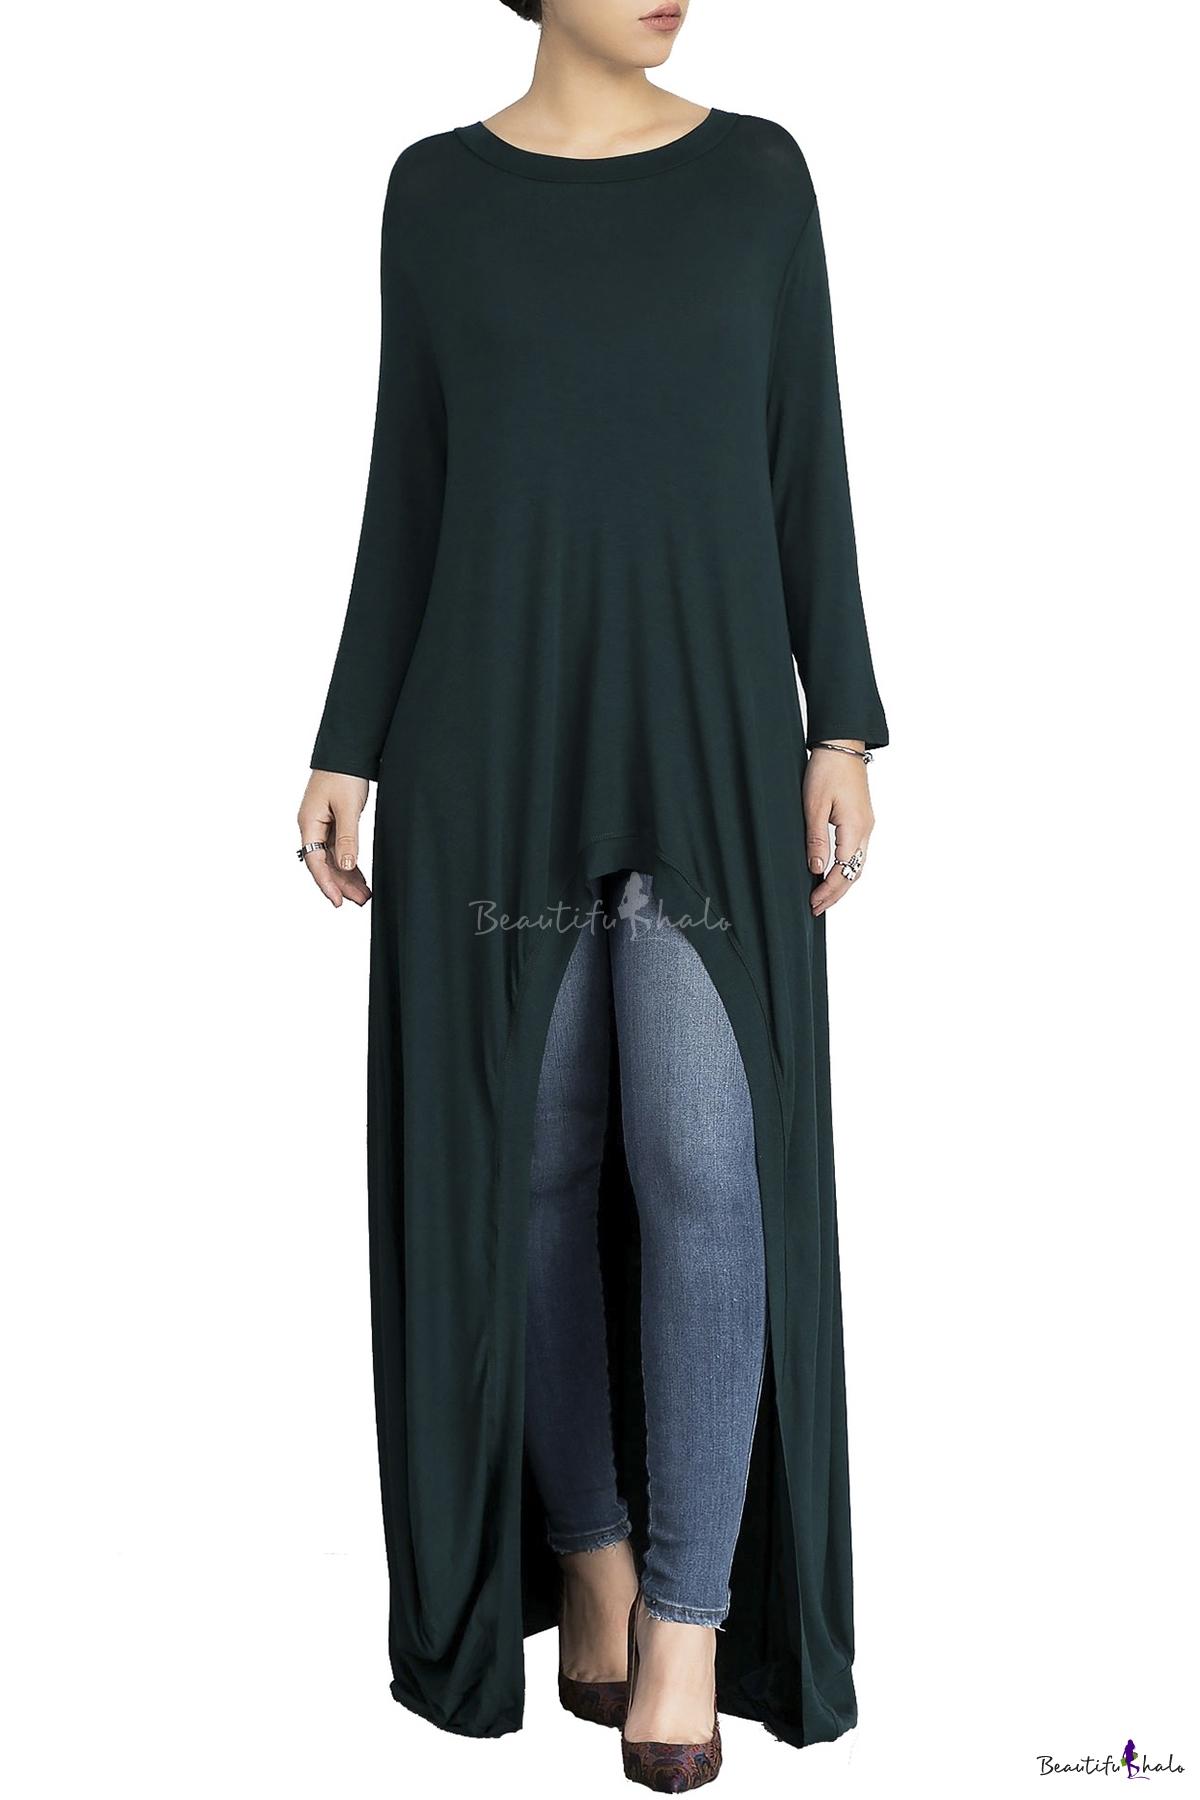 Leisure Round Neck Long Sleeves Loose Draped Dipped Hem Maxi T Shirt